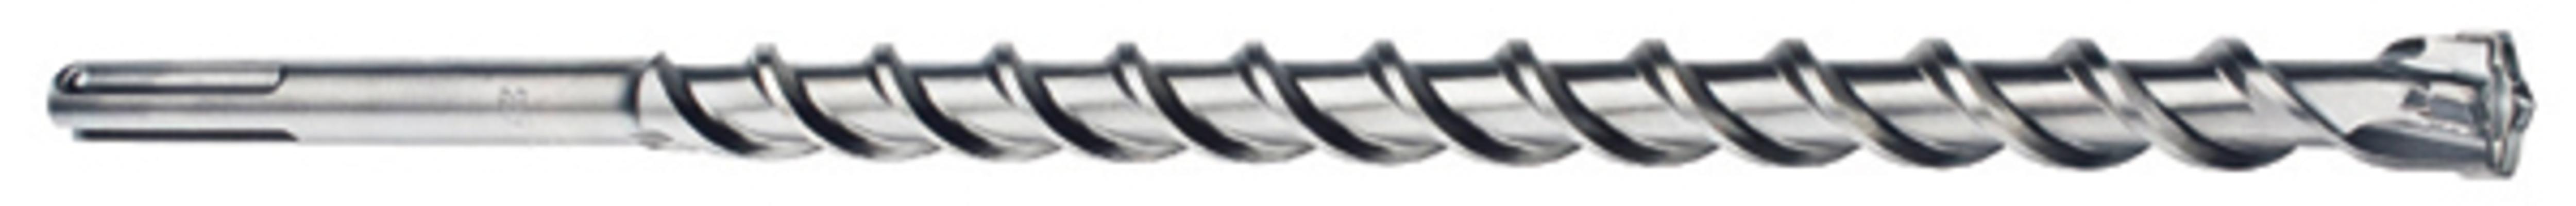 Poranterä SDS-max 14x340/200 mm, 2-leikkuu, Hawera - Poranterä SDS-max 14x340/200 mm, 2-leikkuu